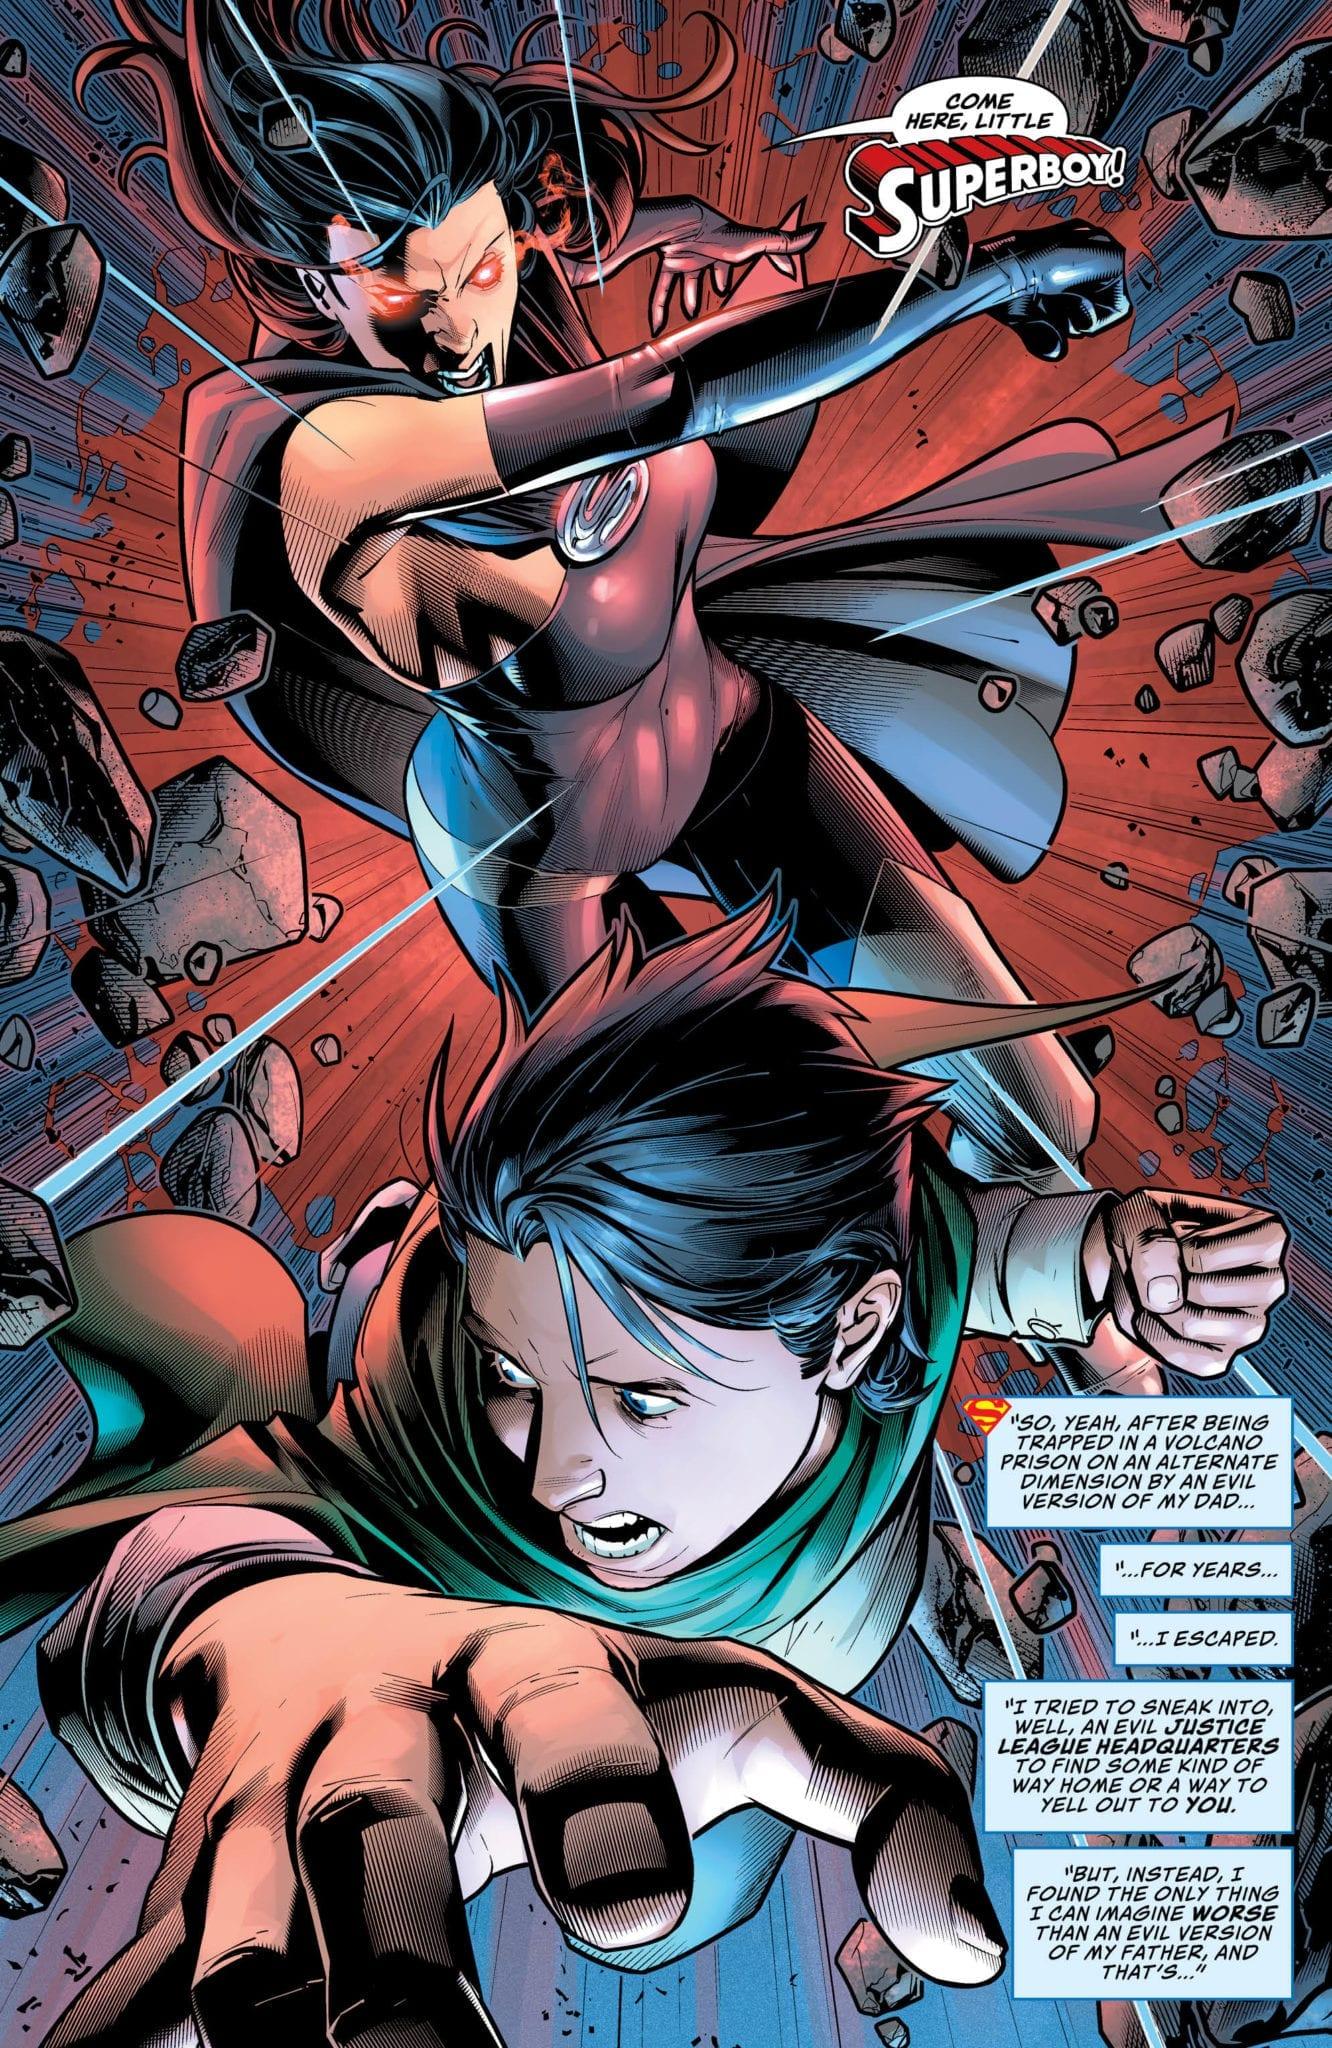 Jon versus evil Lois Lane